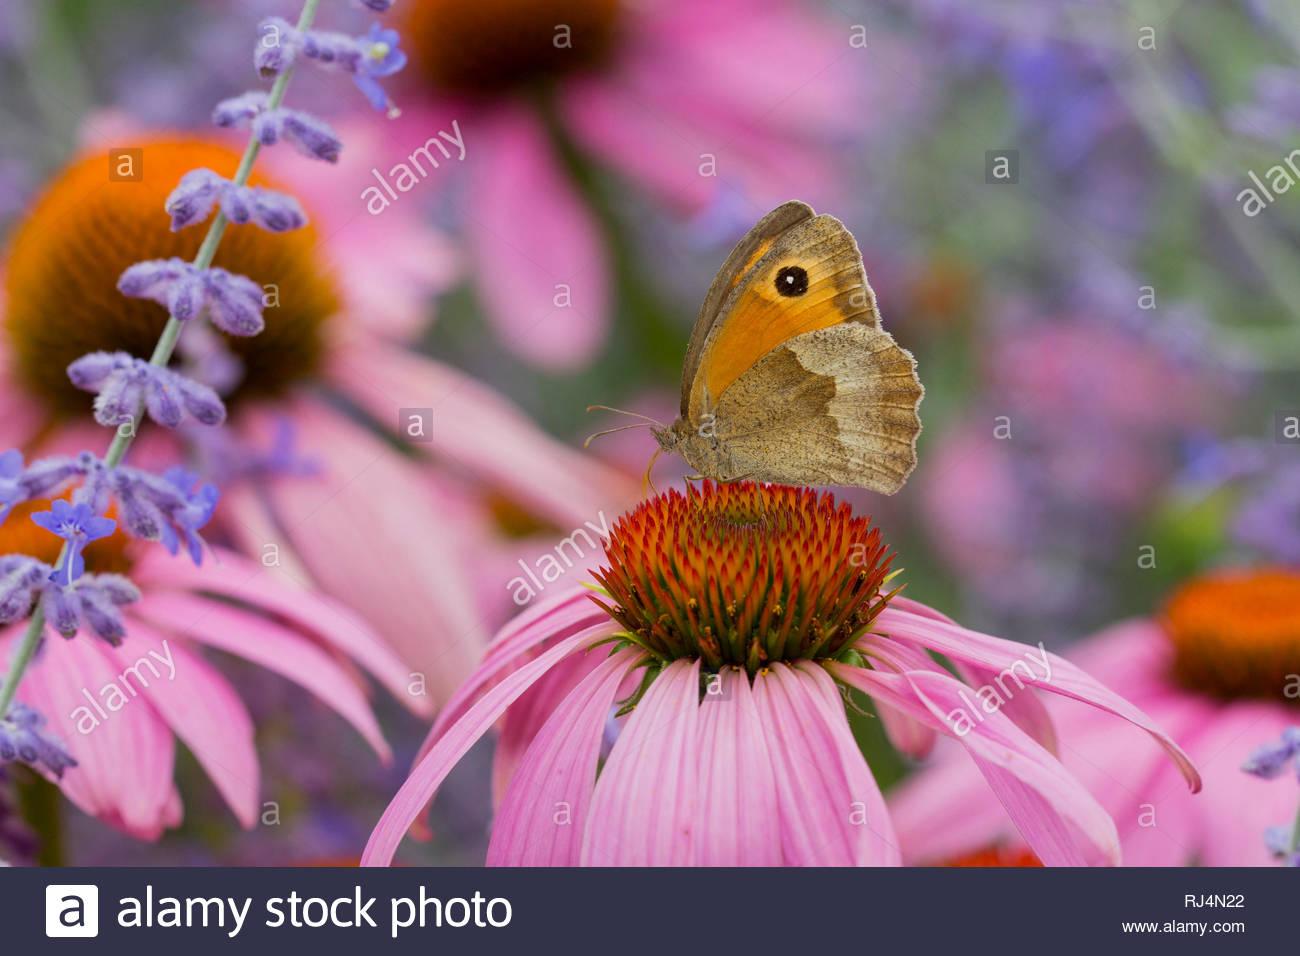 Großes Ochsenauge, Maniola jurtina, auf Rudbeckia-Blüten - Stock Image